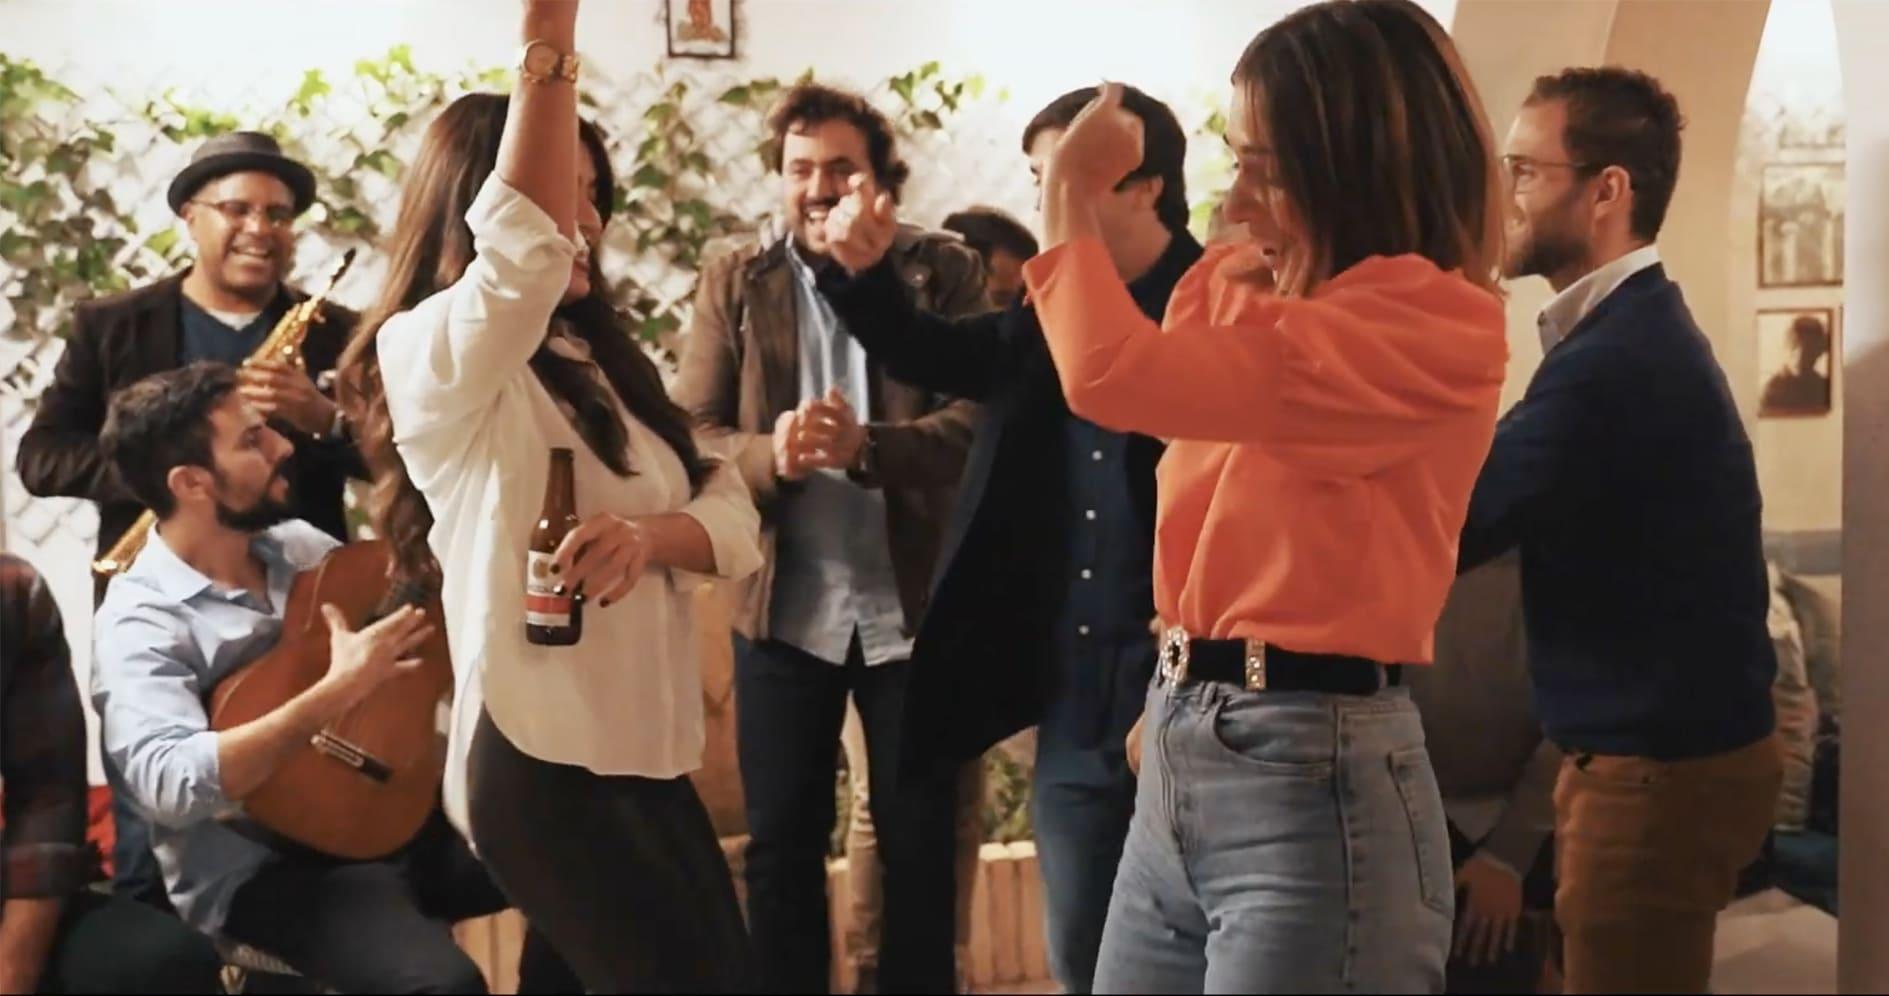 Cerveza La Mezquita os desea Felices Fiestas